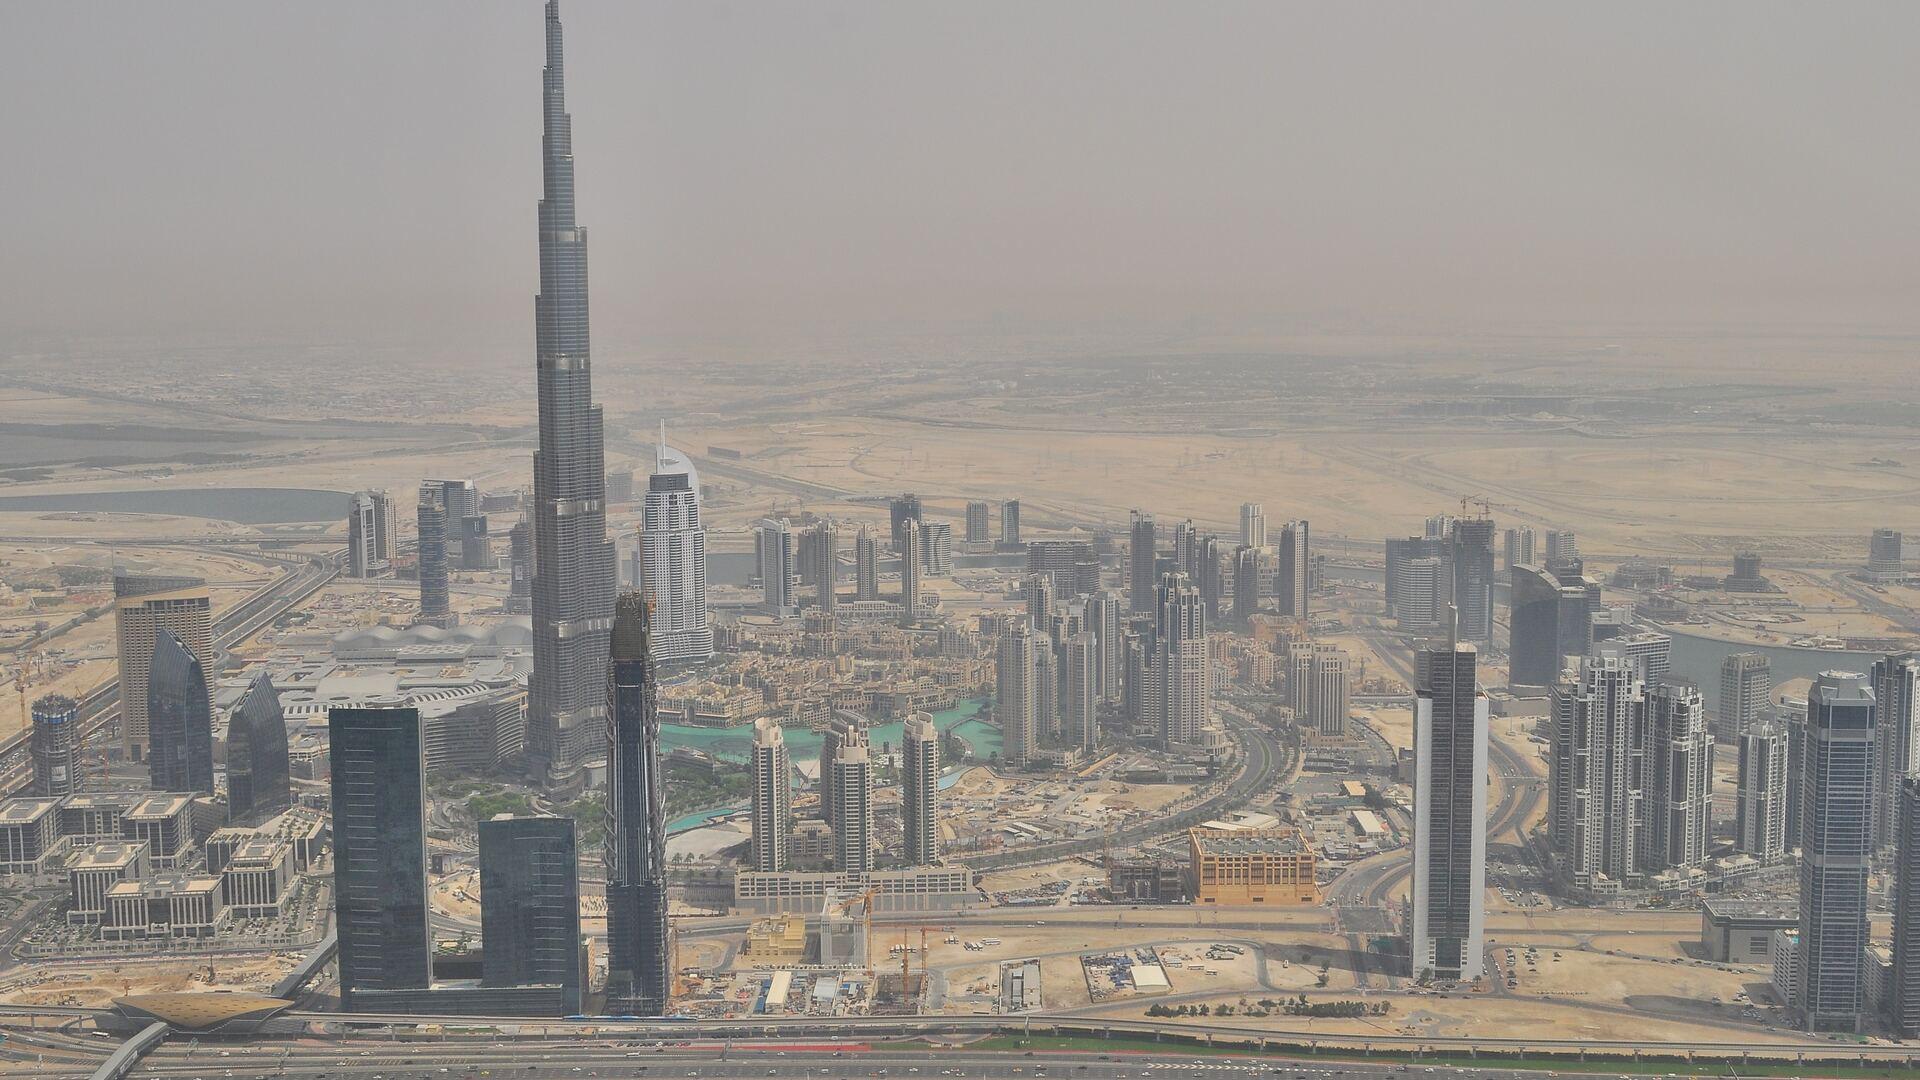 Burj Khalifa Hd Photos: 1920x1080 Burj Khalifa Dubai 4k Laptop Full HD 1080P HD 4k